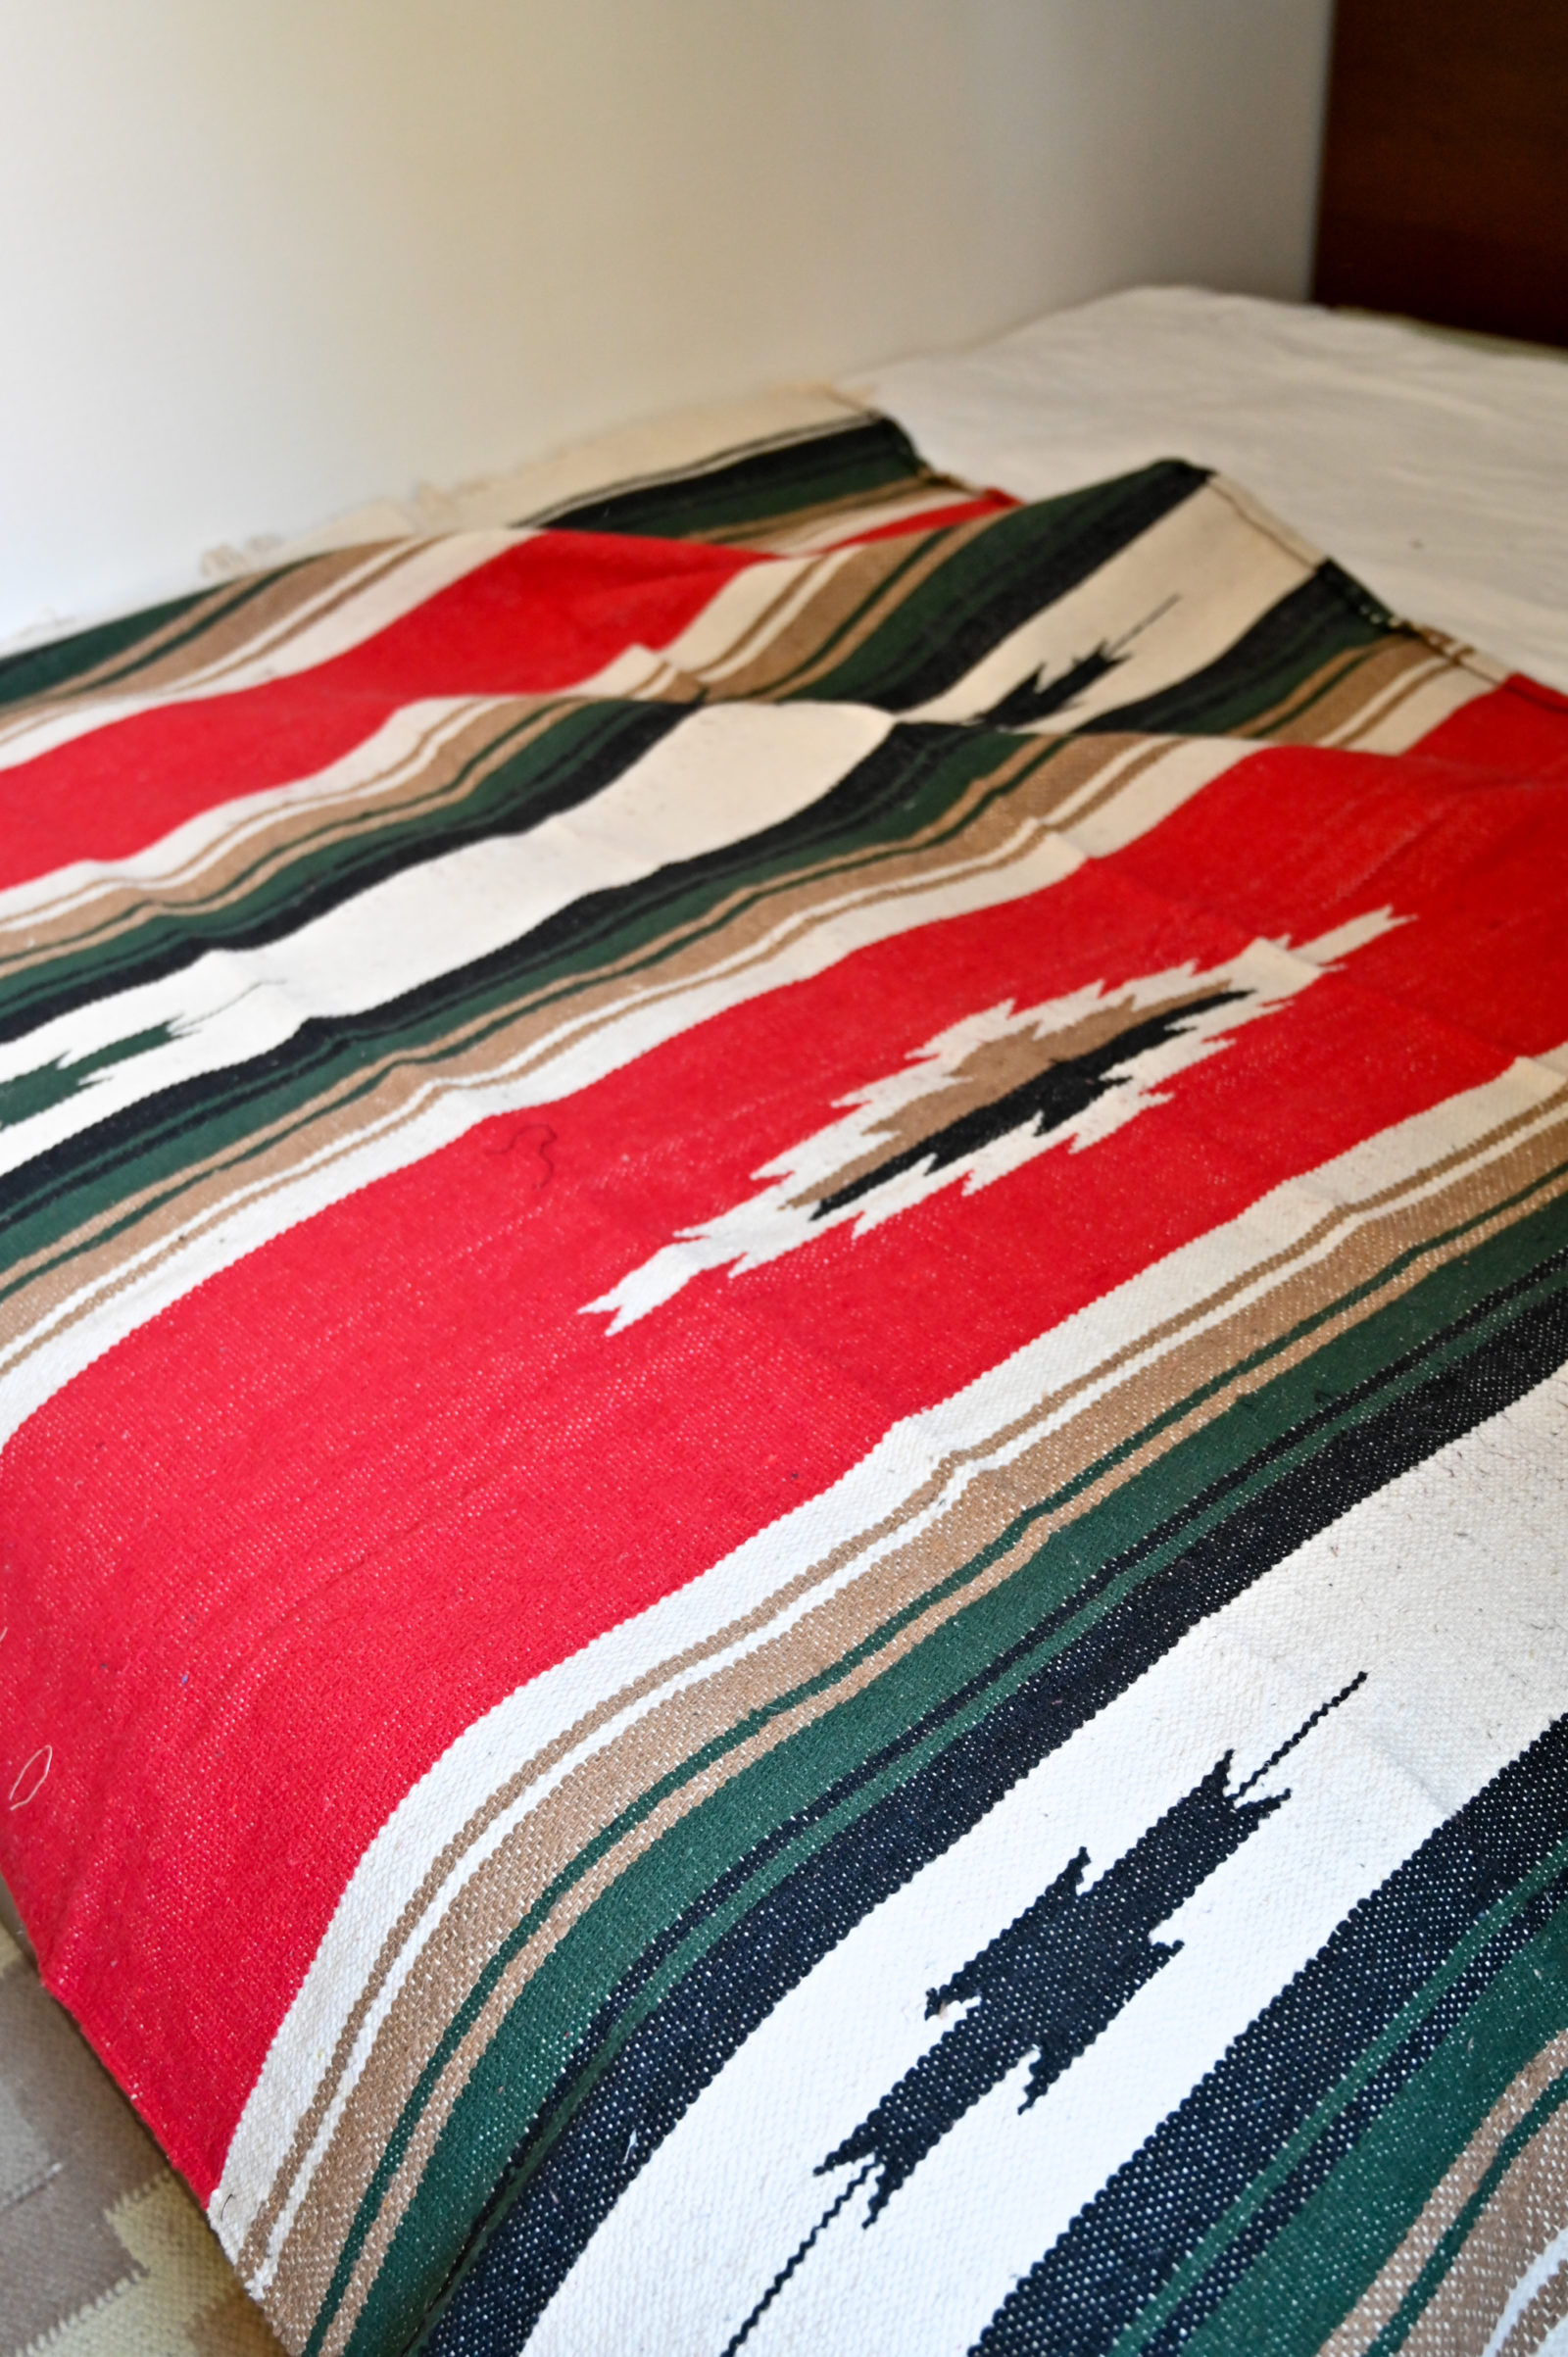 iron resin calle navy couverture mexicaine serape prix acheter